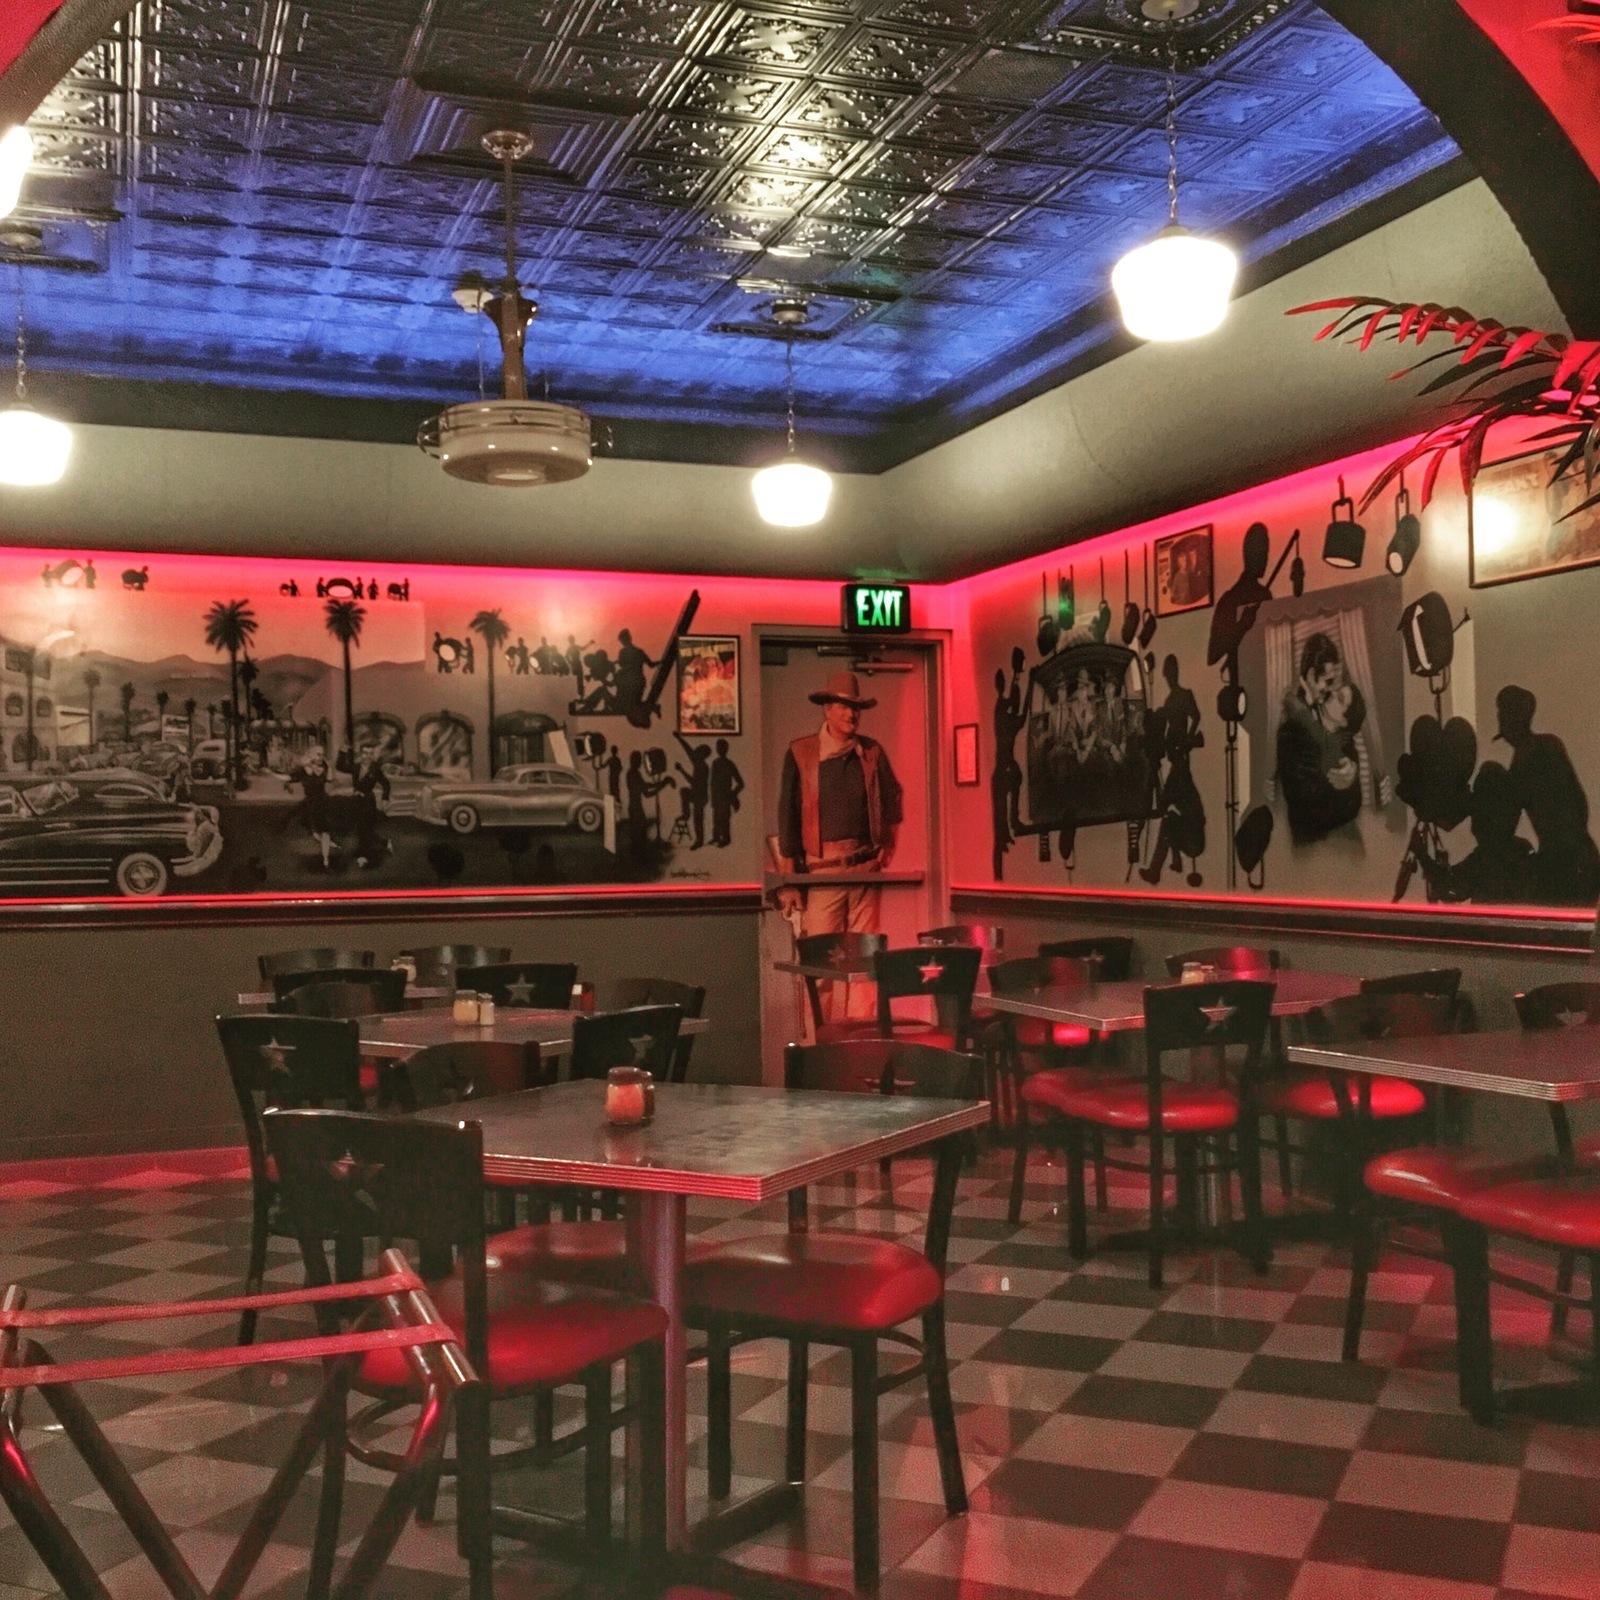 Hollywood Restaurant Cortland New York